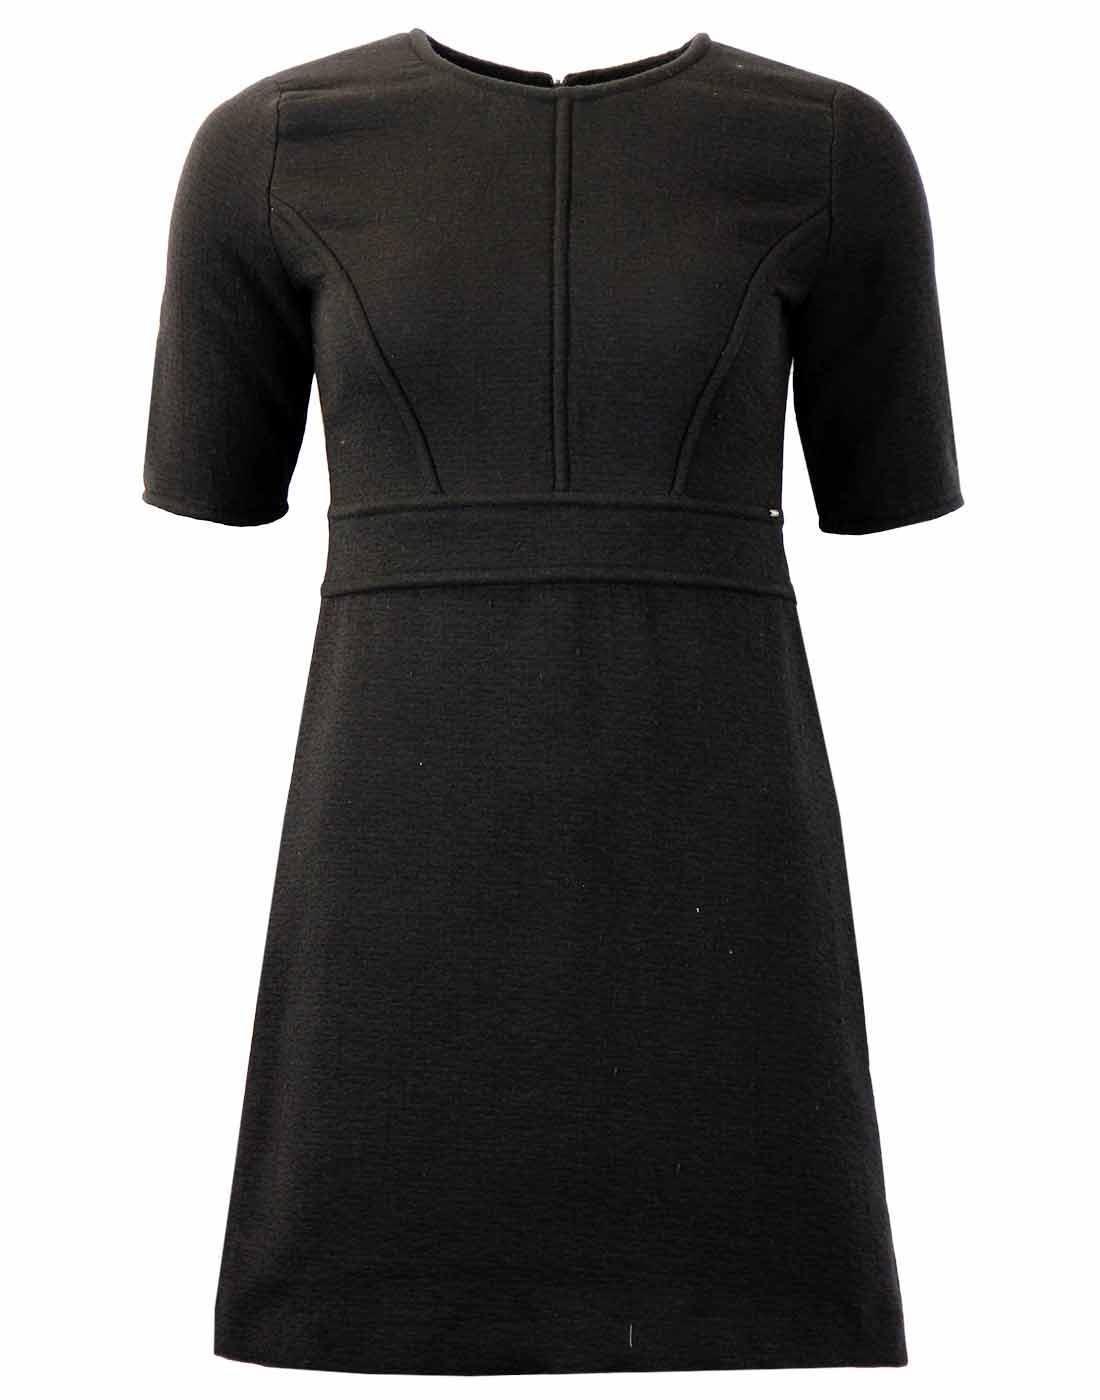 Savick PEPE JEANS Retro Woven 60s Mod Dress